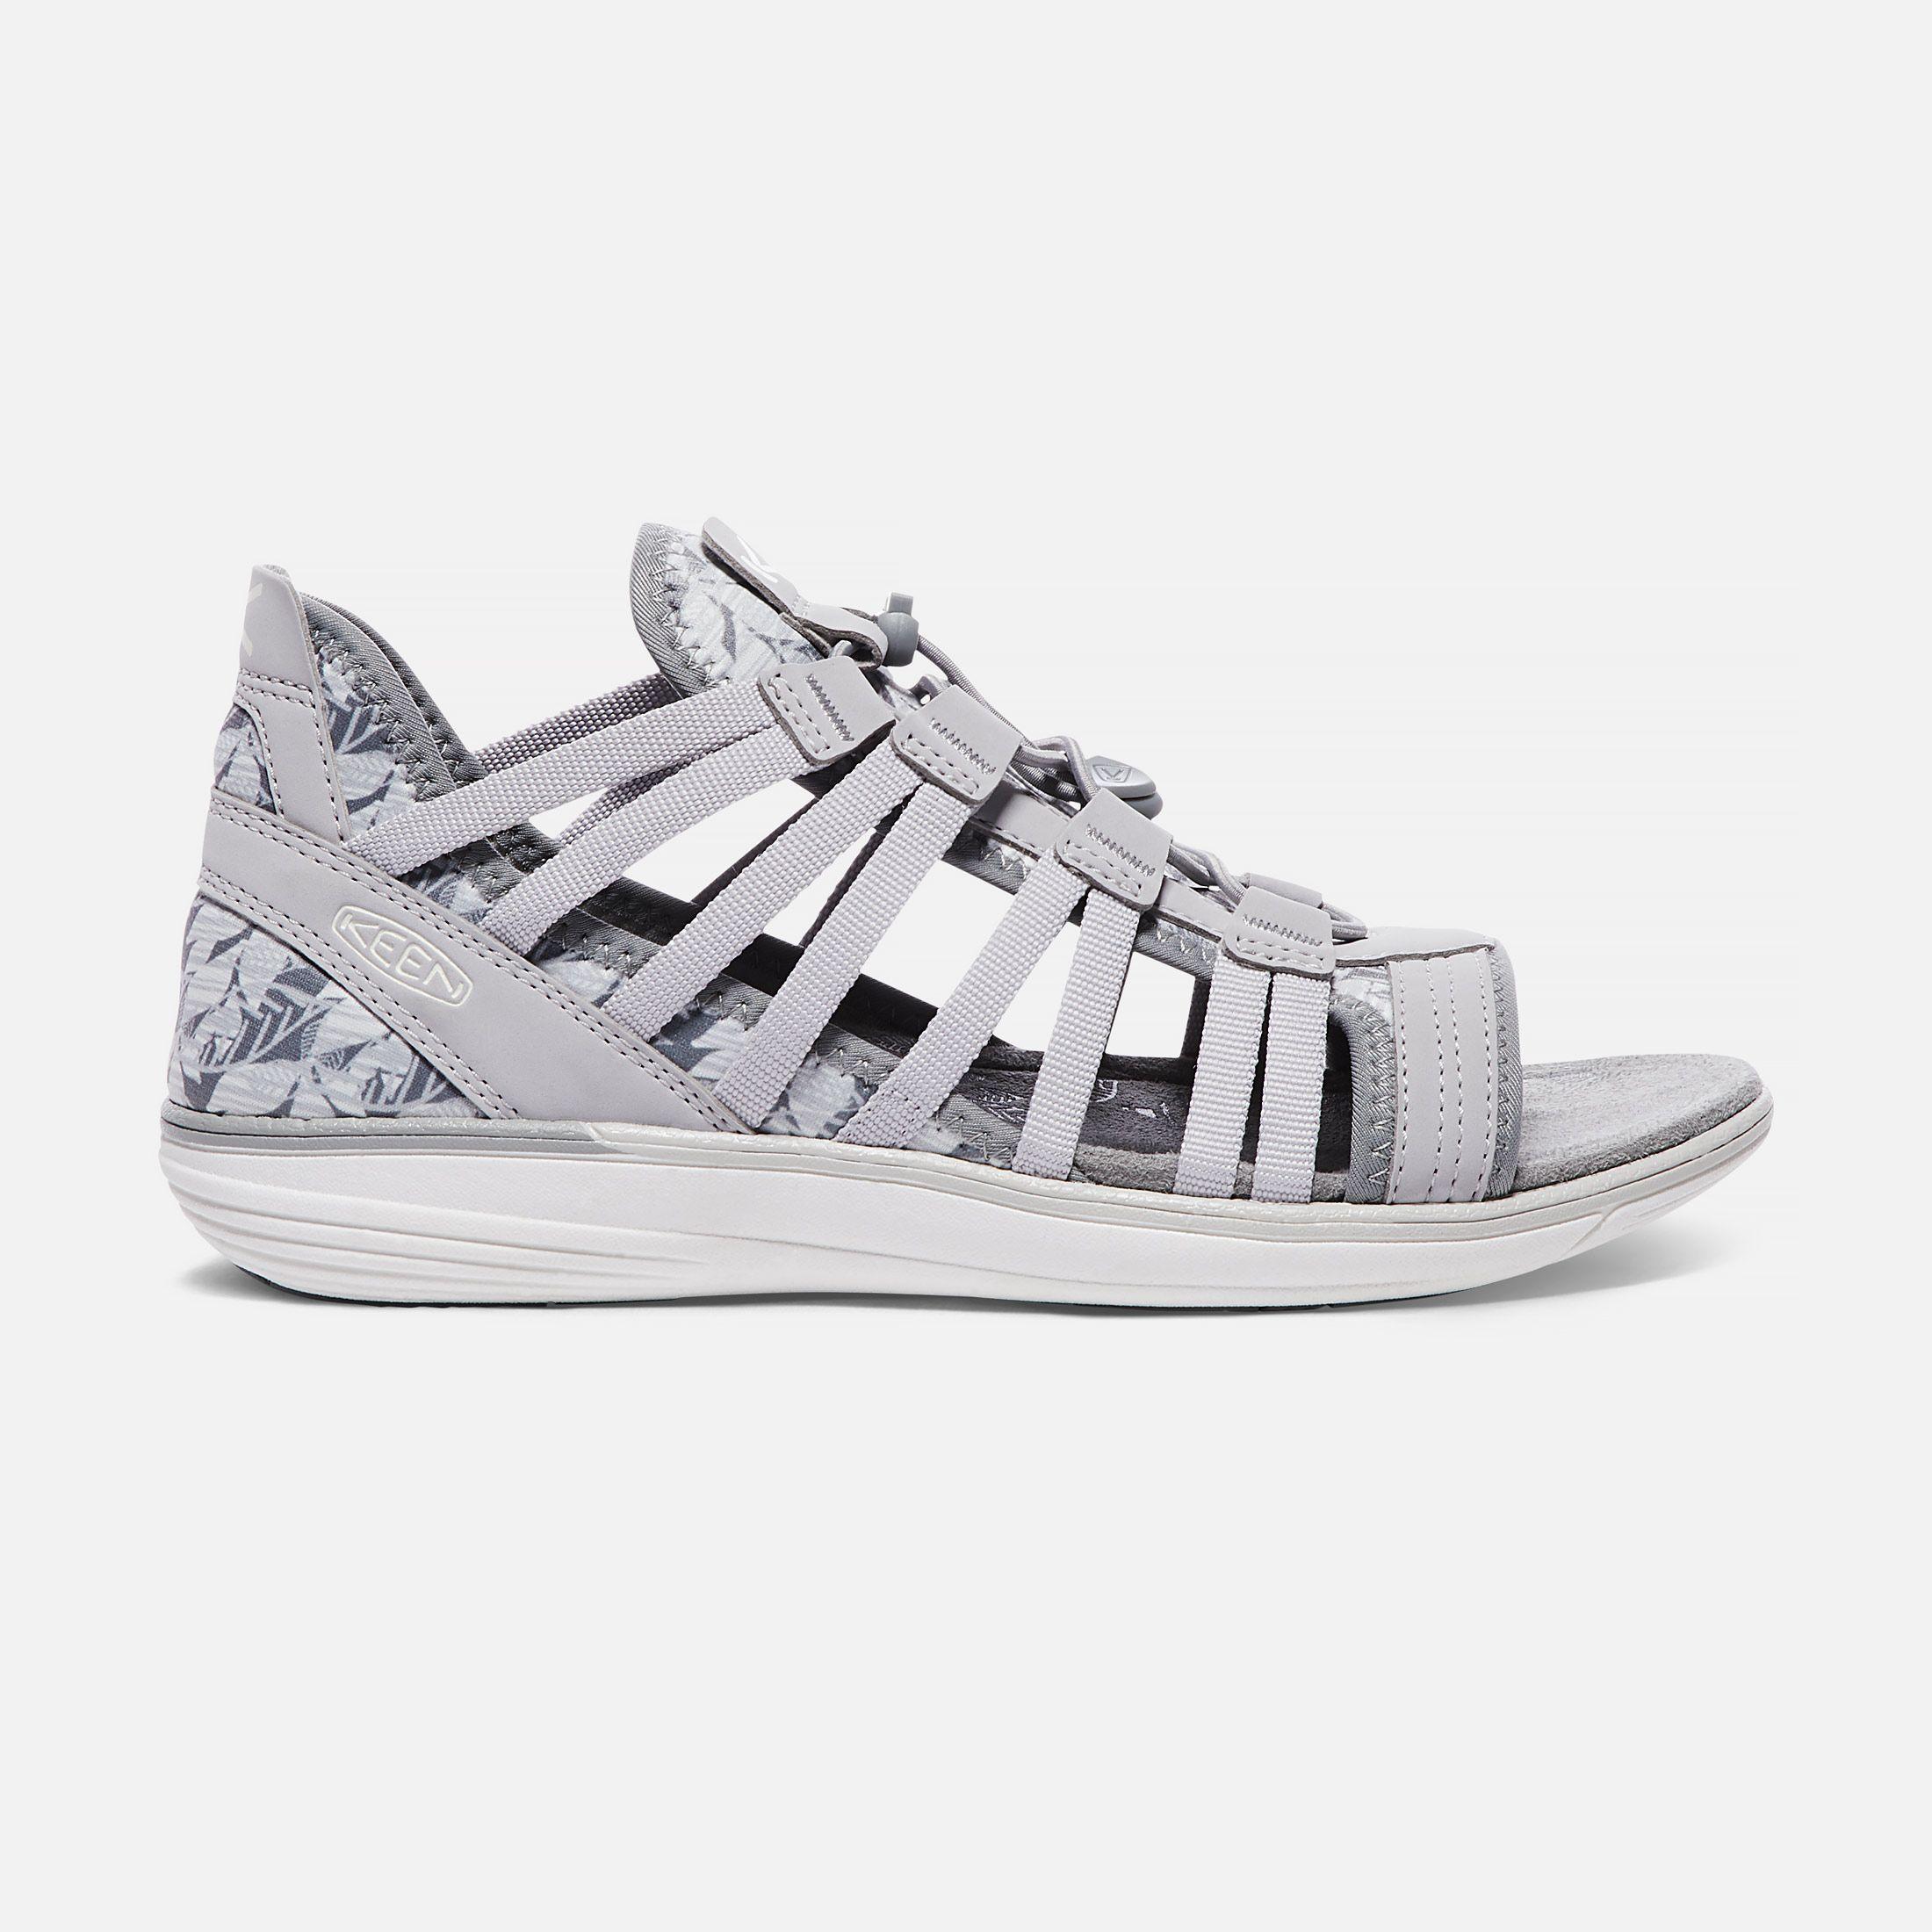 d775846b8bd8 Keen Women s Maya Gladiator Sandals Size 10.5